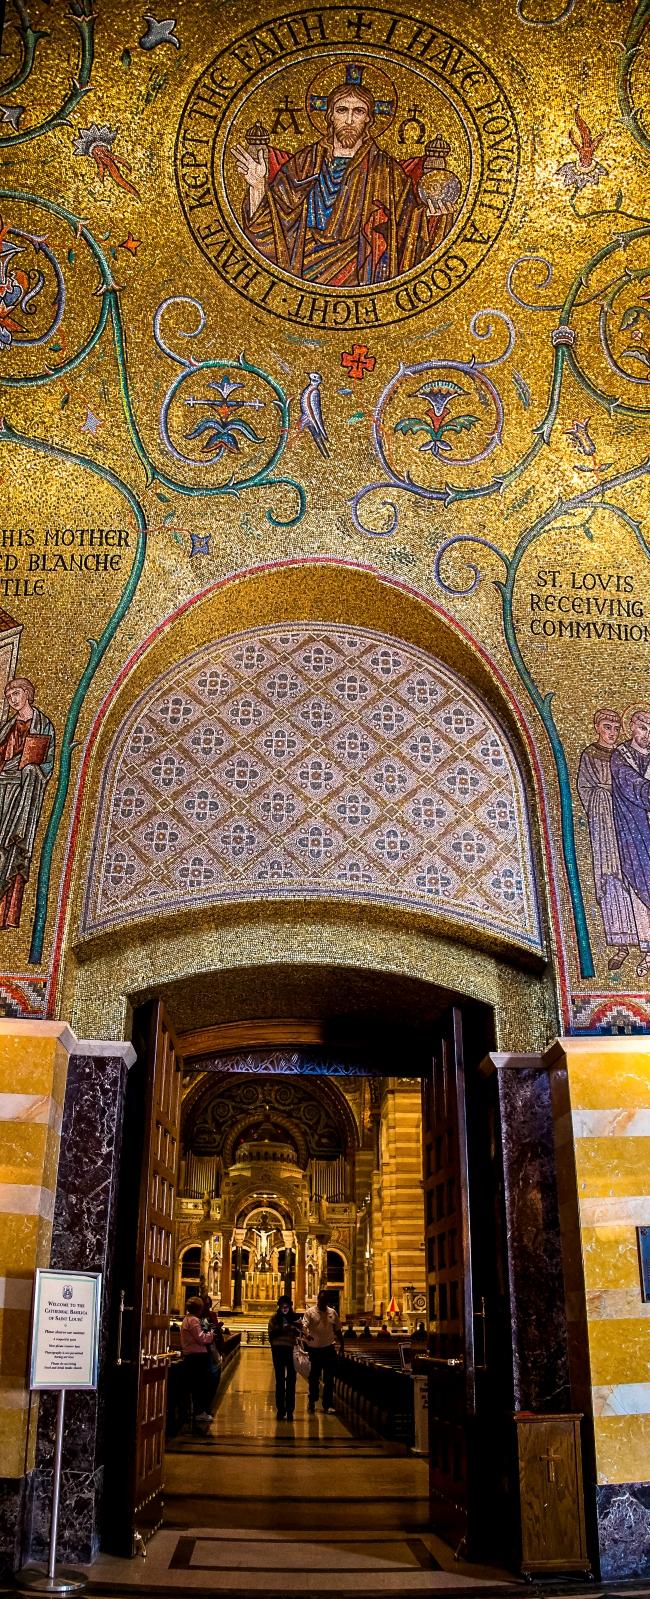 saint louis cathedral basilica interior-30 small